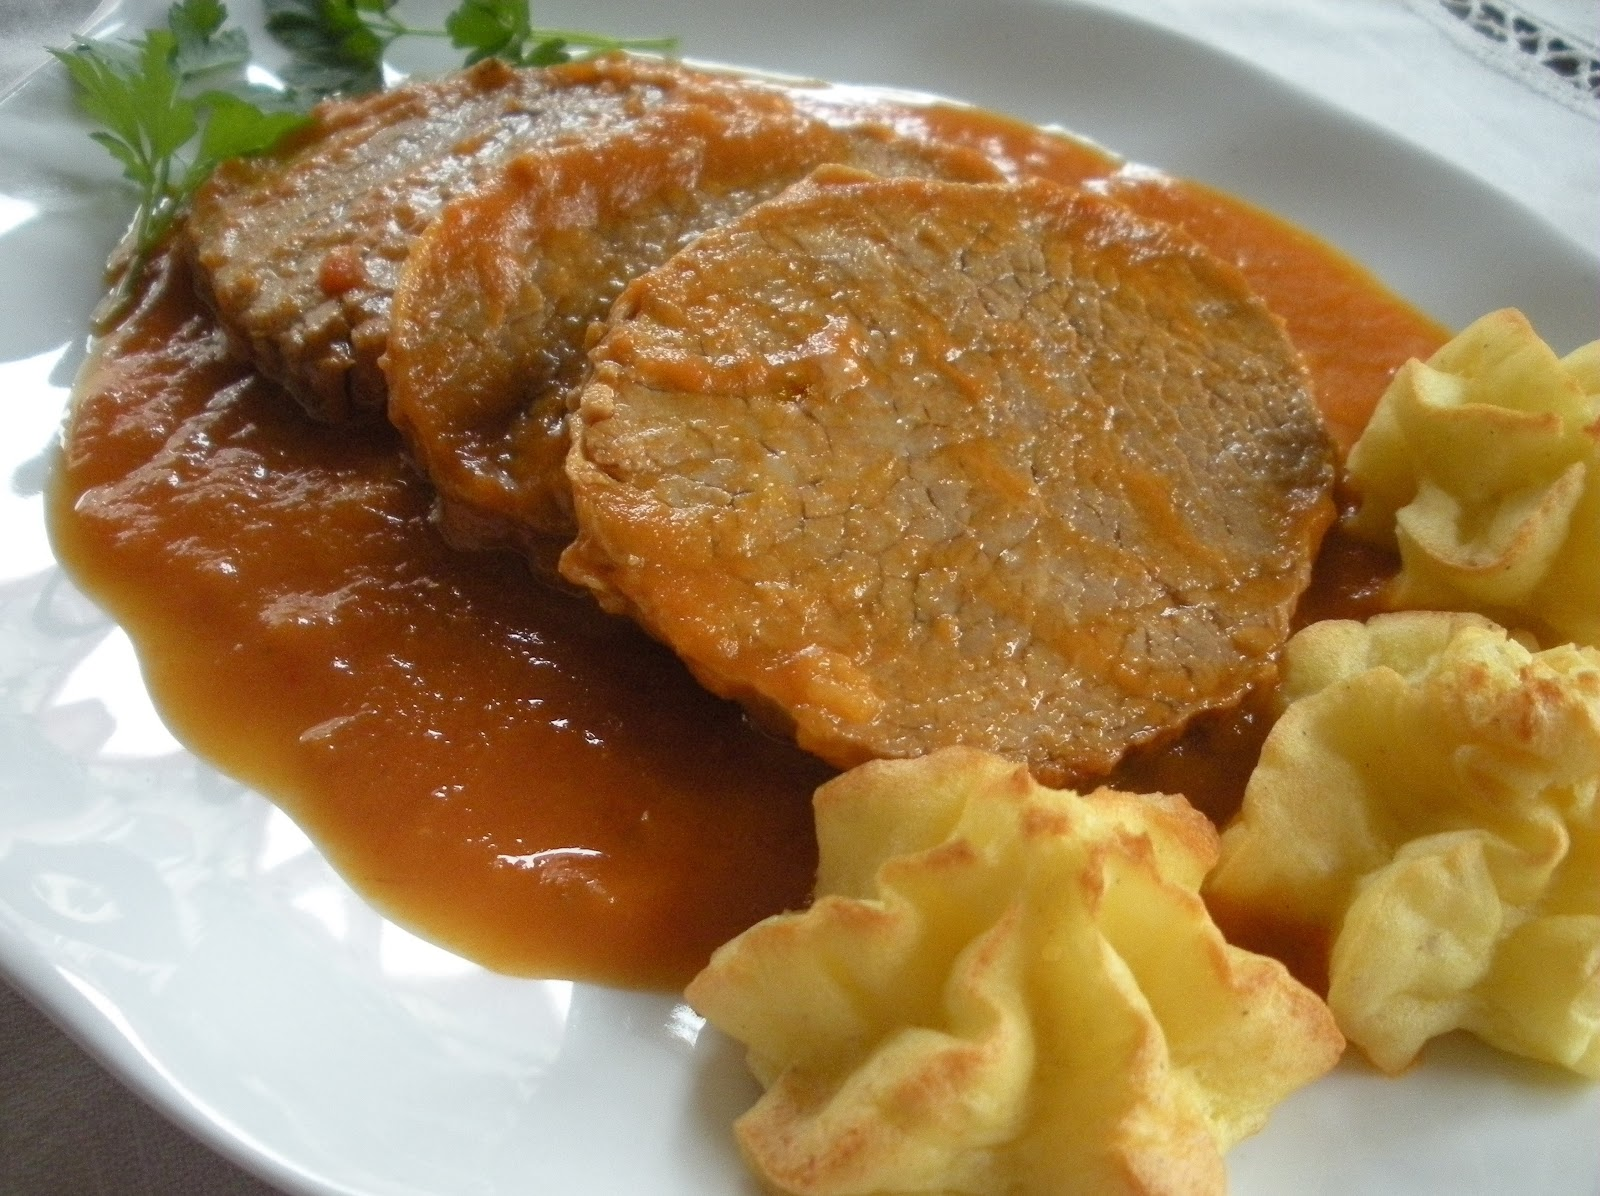 Receta espa ola redondo de ternera en salsa espa ola - Filetes de ternera en salsa de cebolla ...